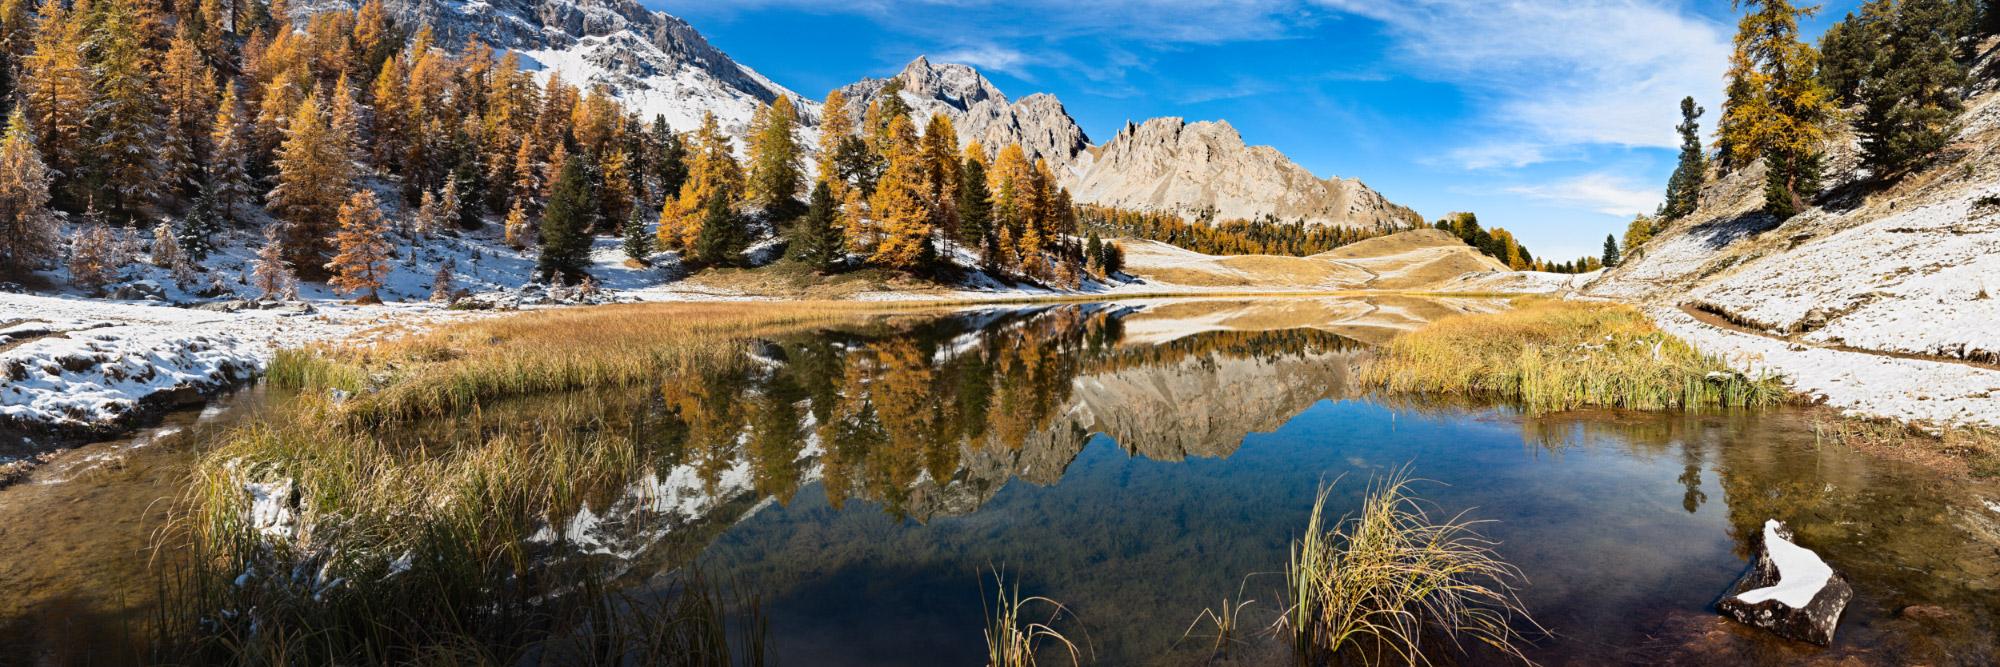 lac miroir ceillac queyras hautes alpes herve sentucq